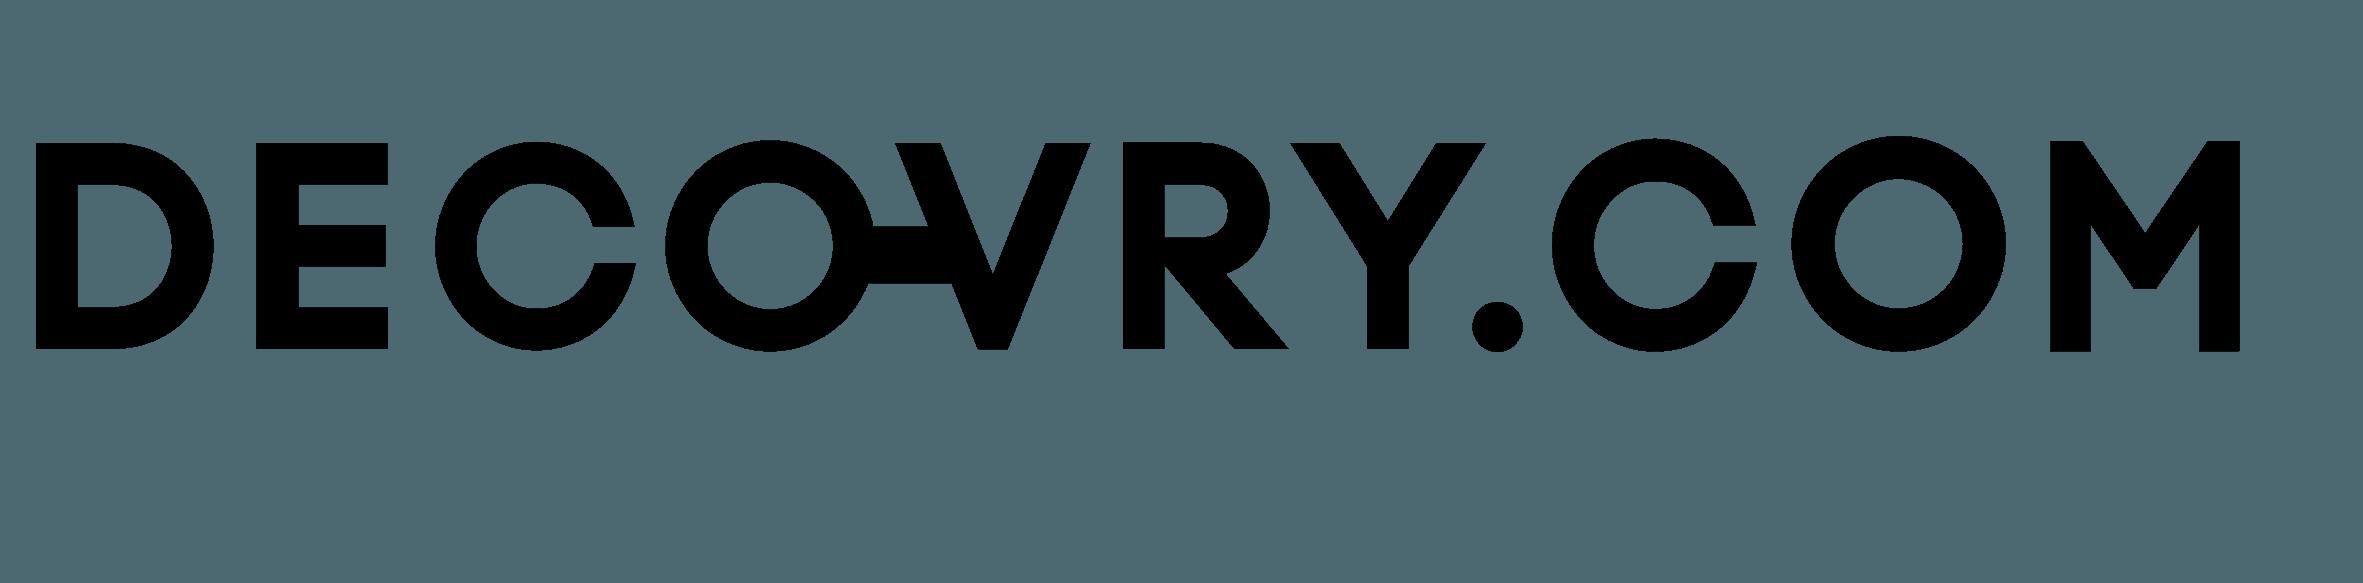 Decovry Office 365 customer case